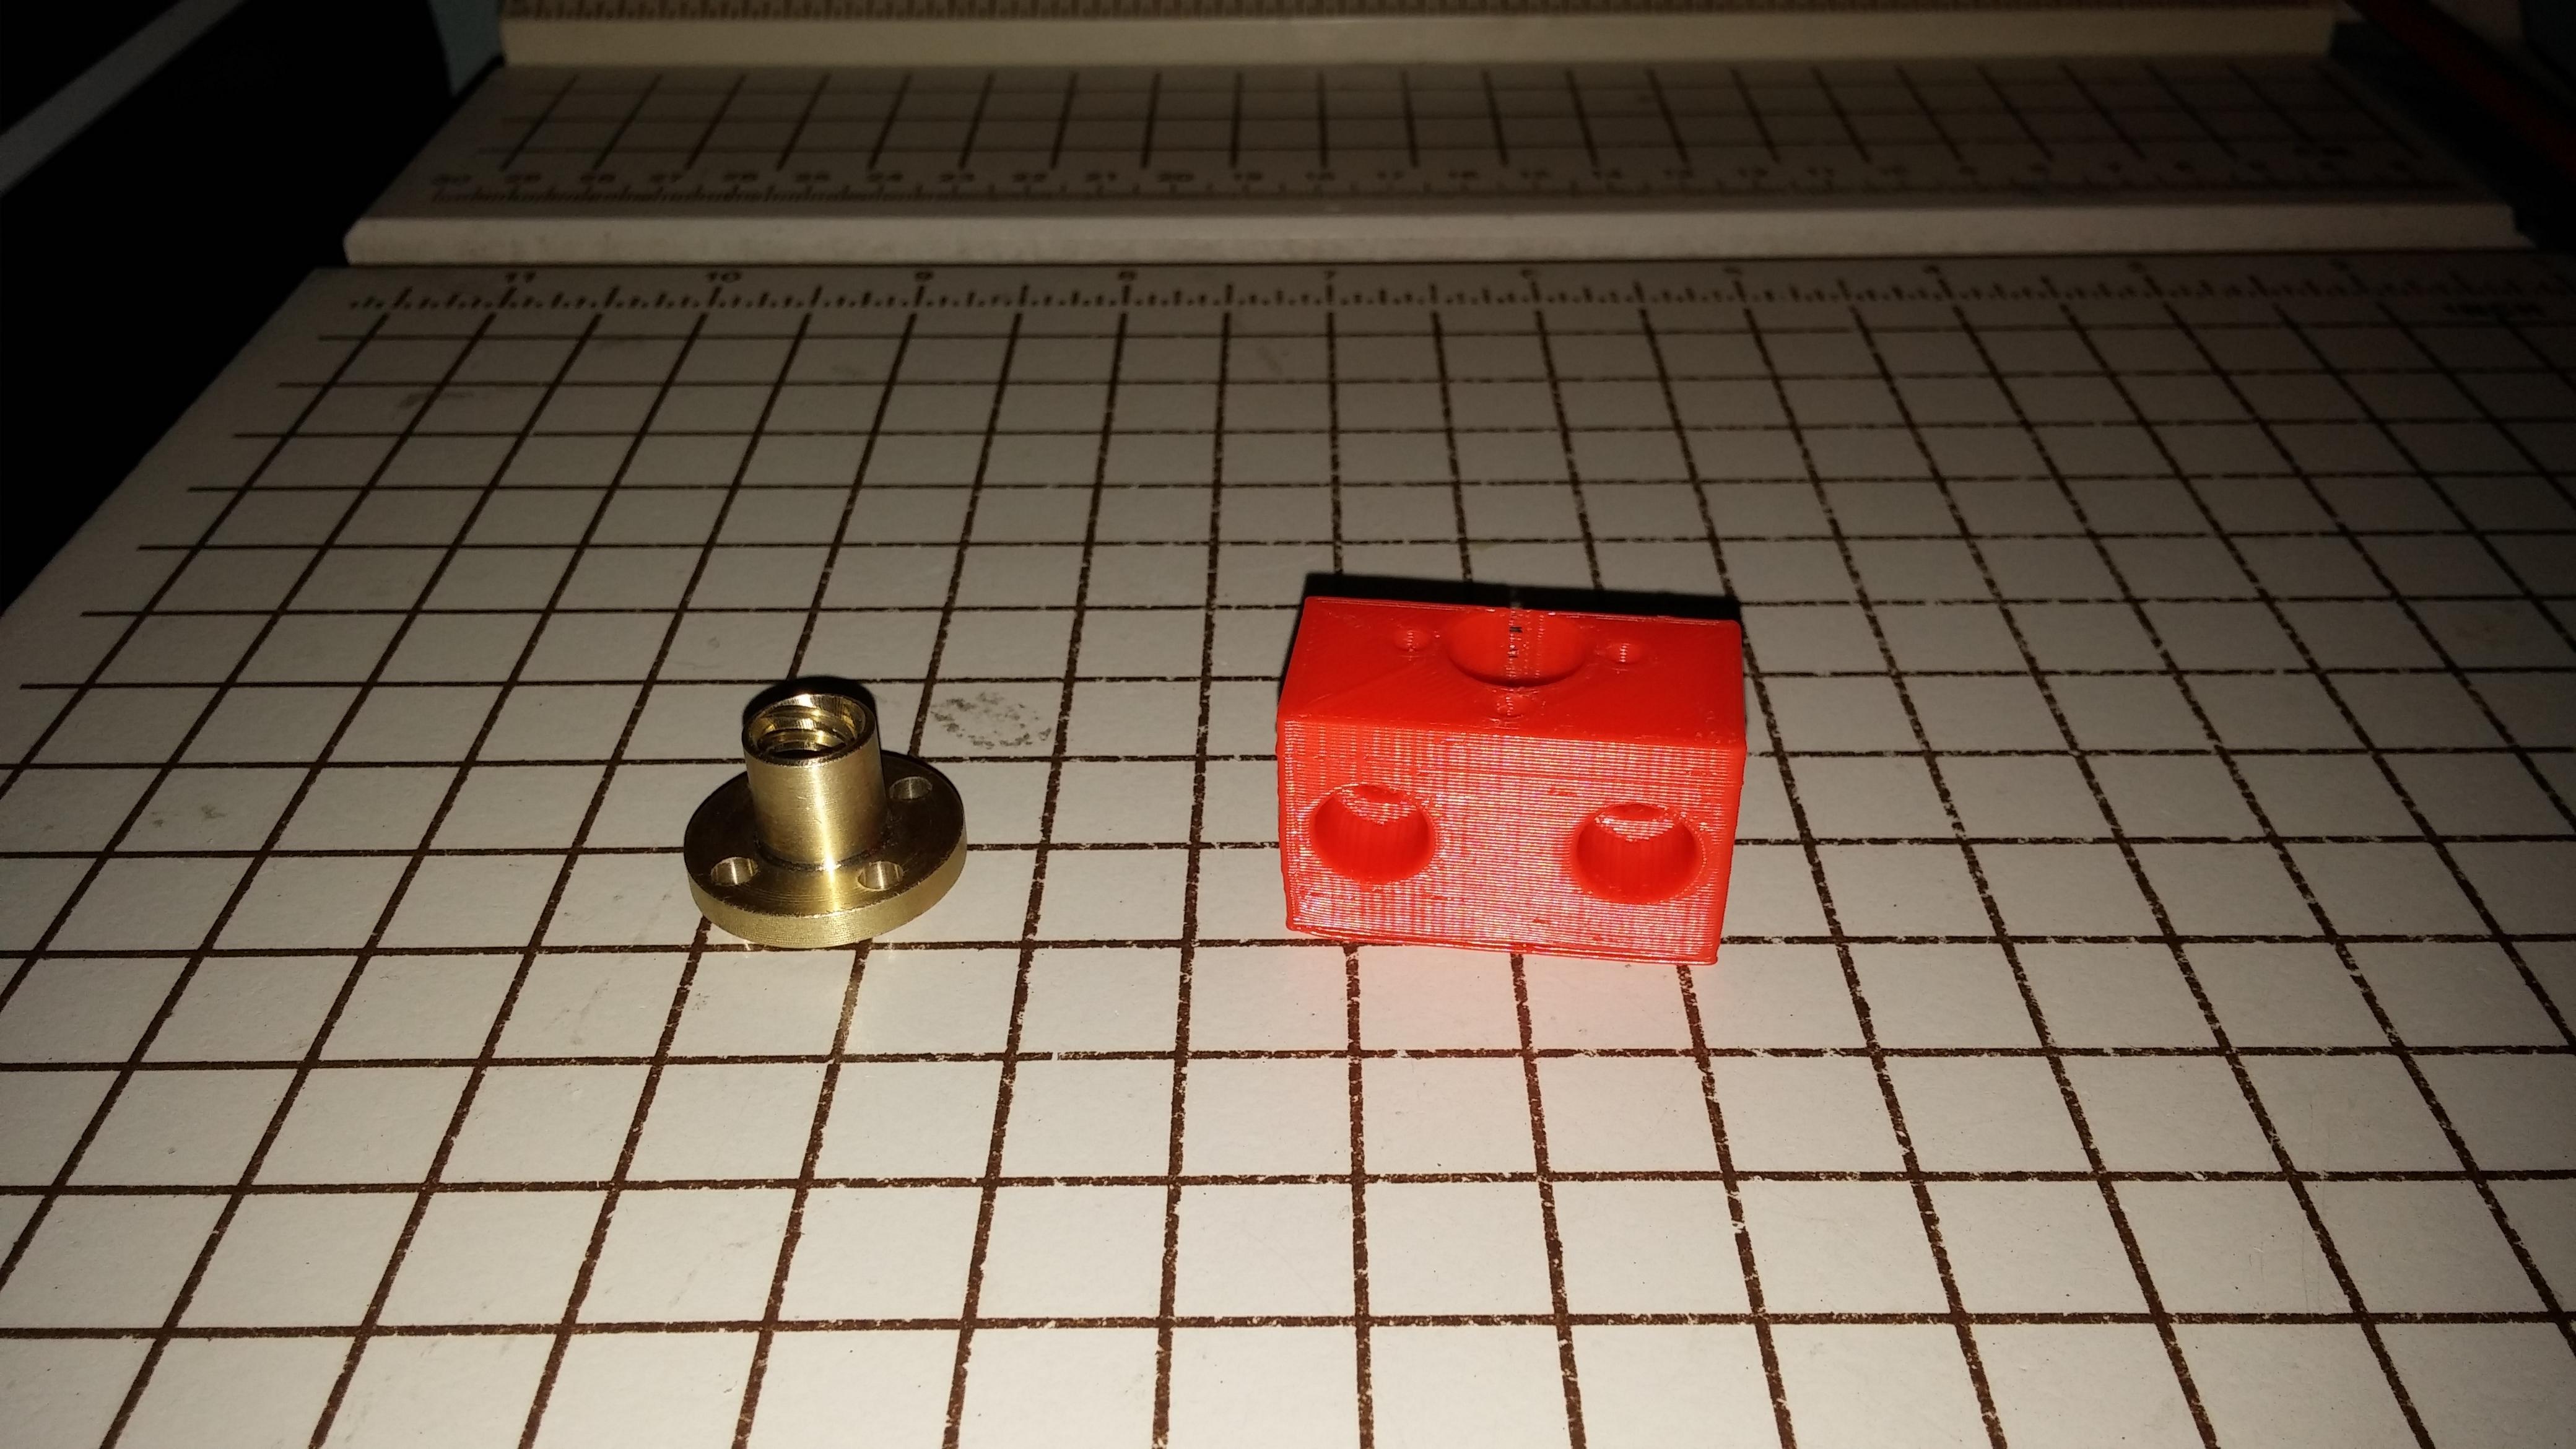 0309151615.jpg Download free STL file NCS P3-v Steel Brass Lead screw mount • 3D print object, trentjw